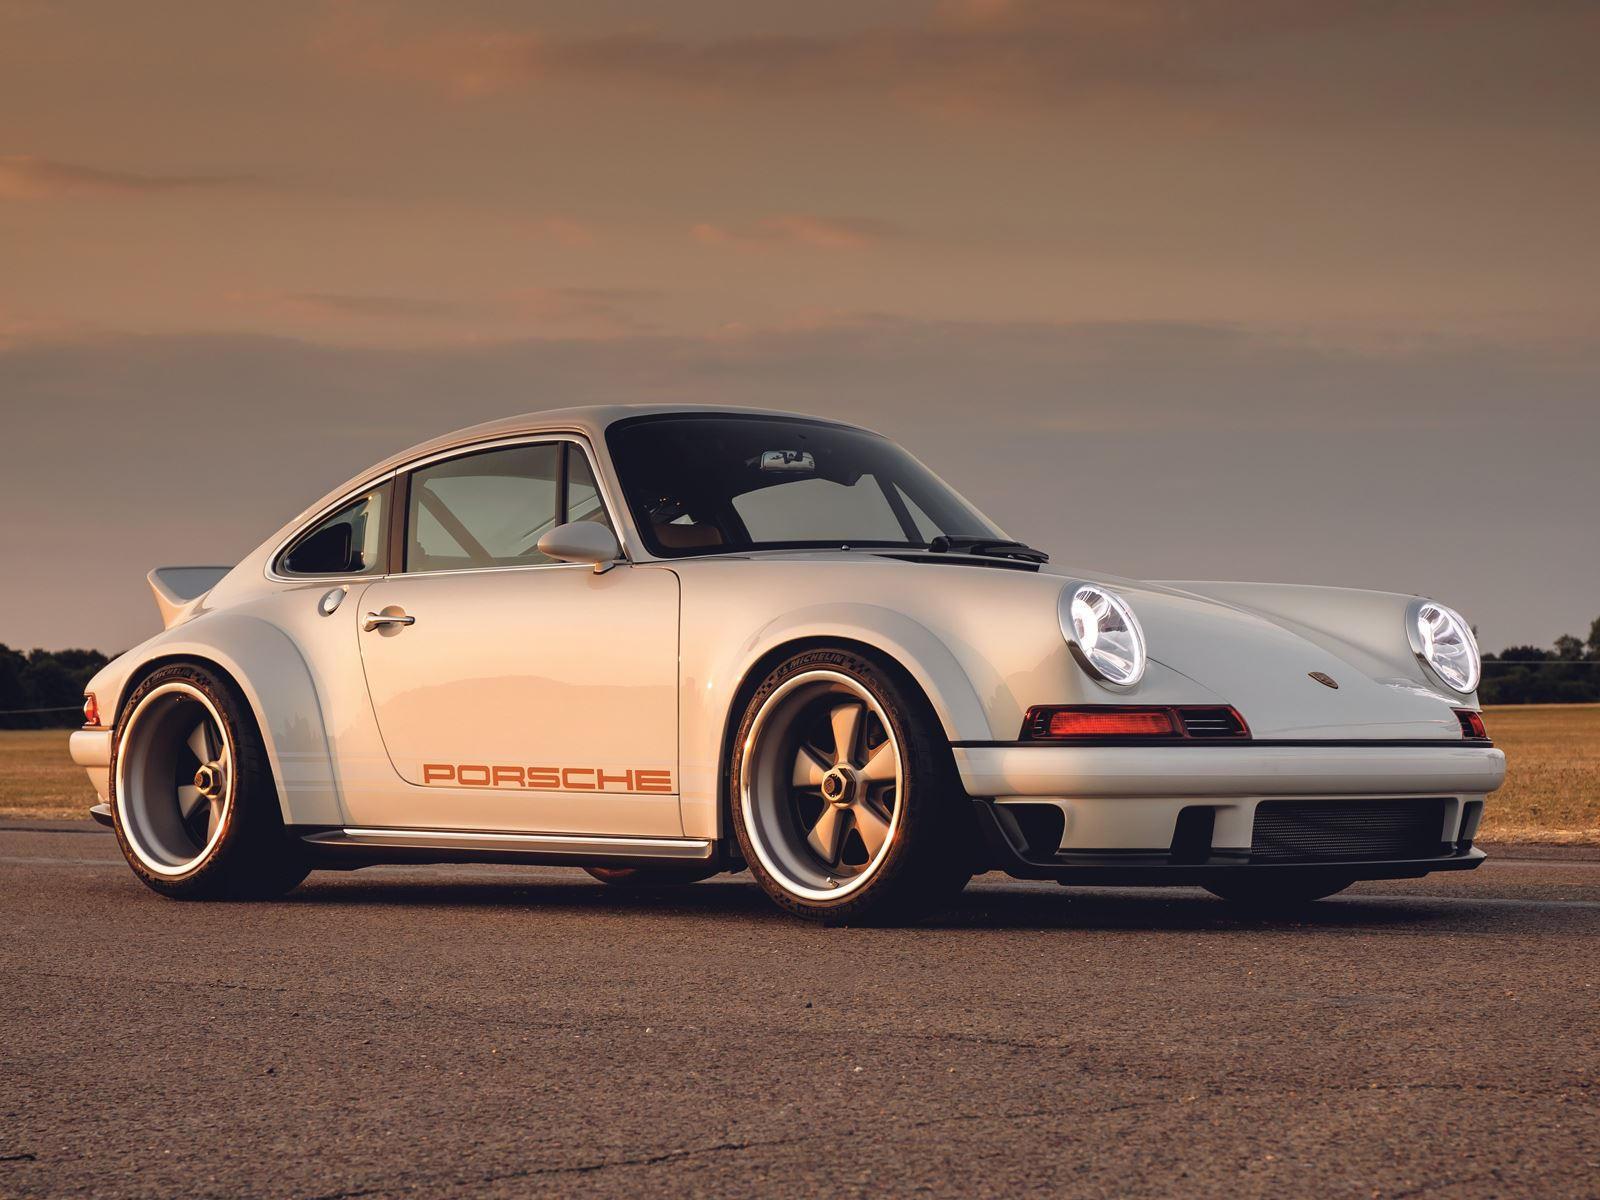 Air Cooled Porsche >> Singer Unveils Most Advanced Air Cooled Porsche 911 In The World